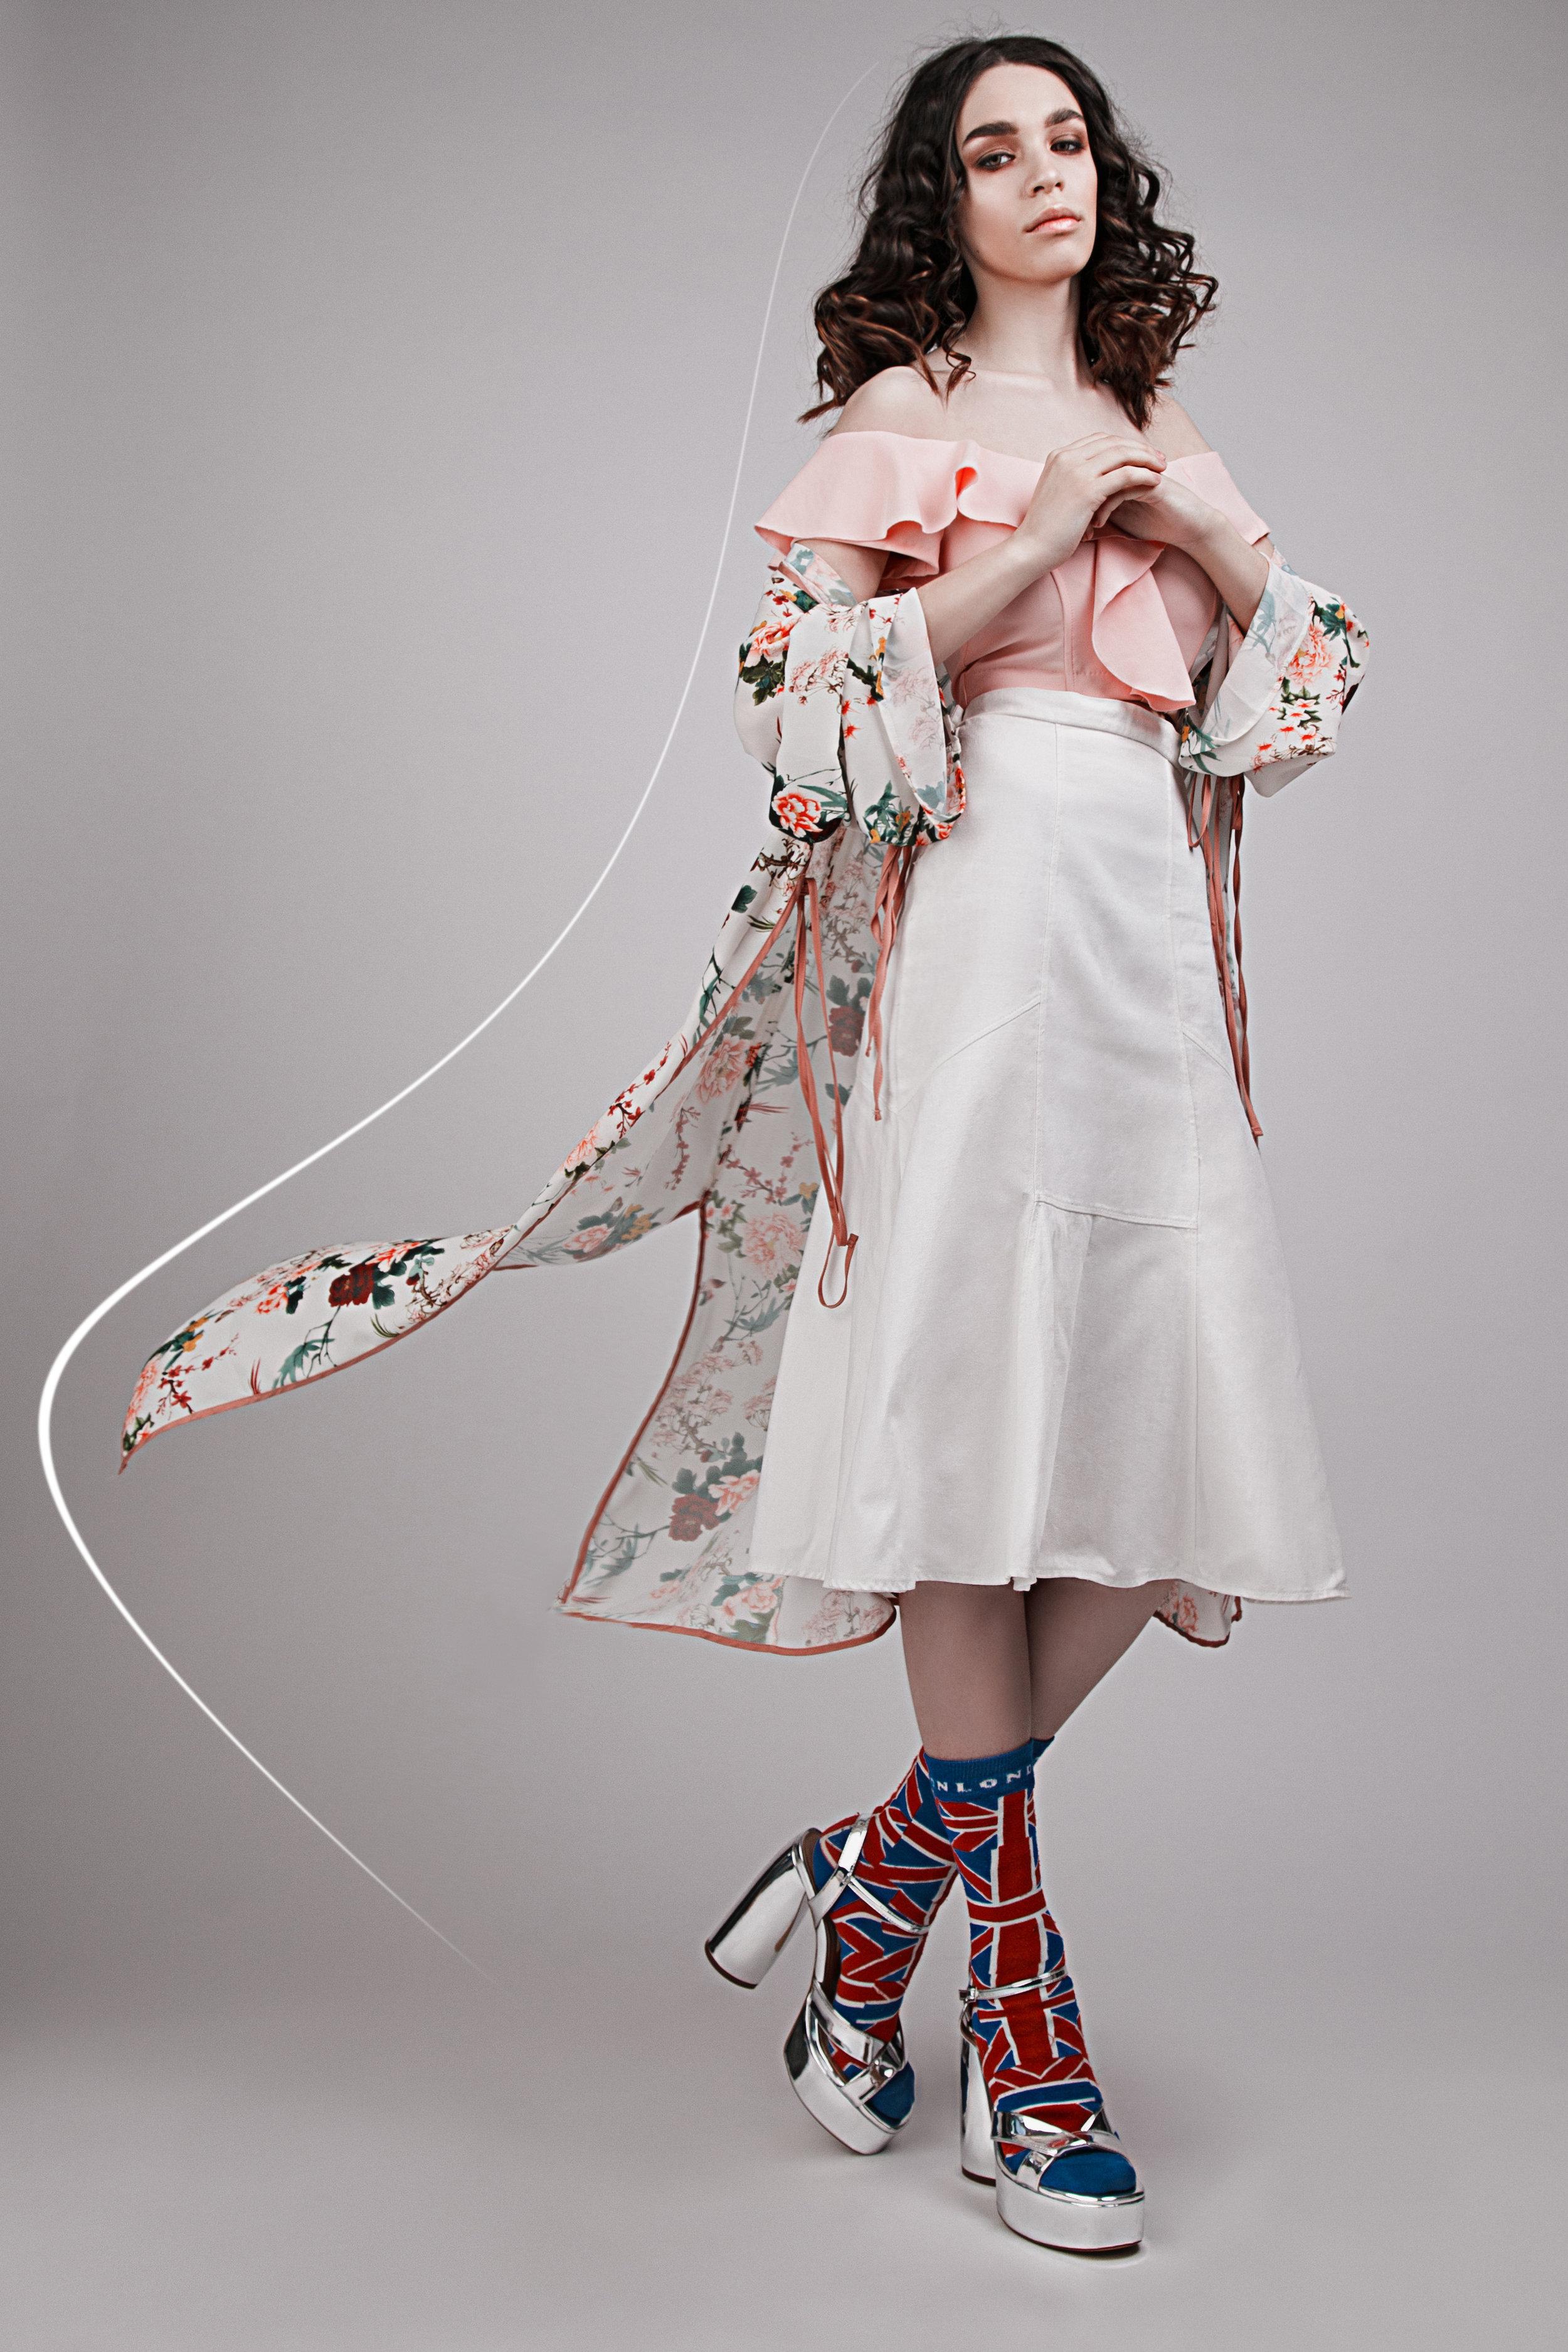 blouse Zara, skirt Befree, shoes Zara, mantle Stradivarius, socks Futurino